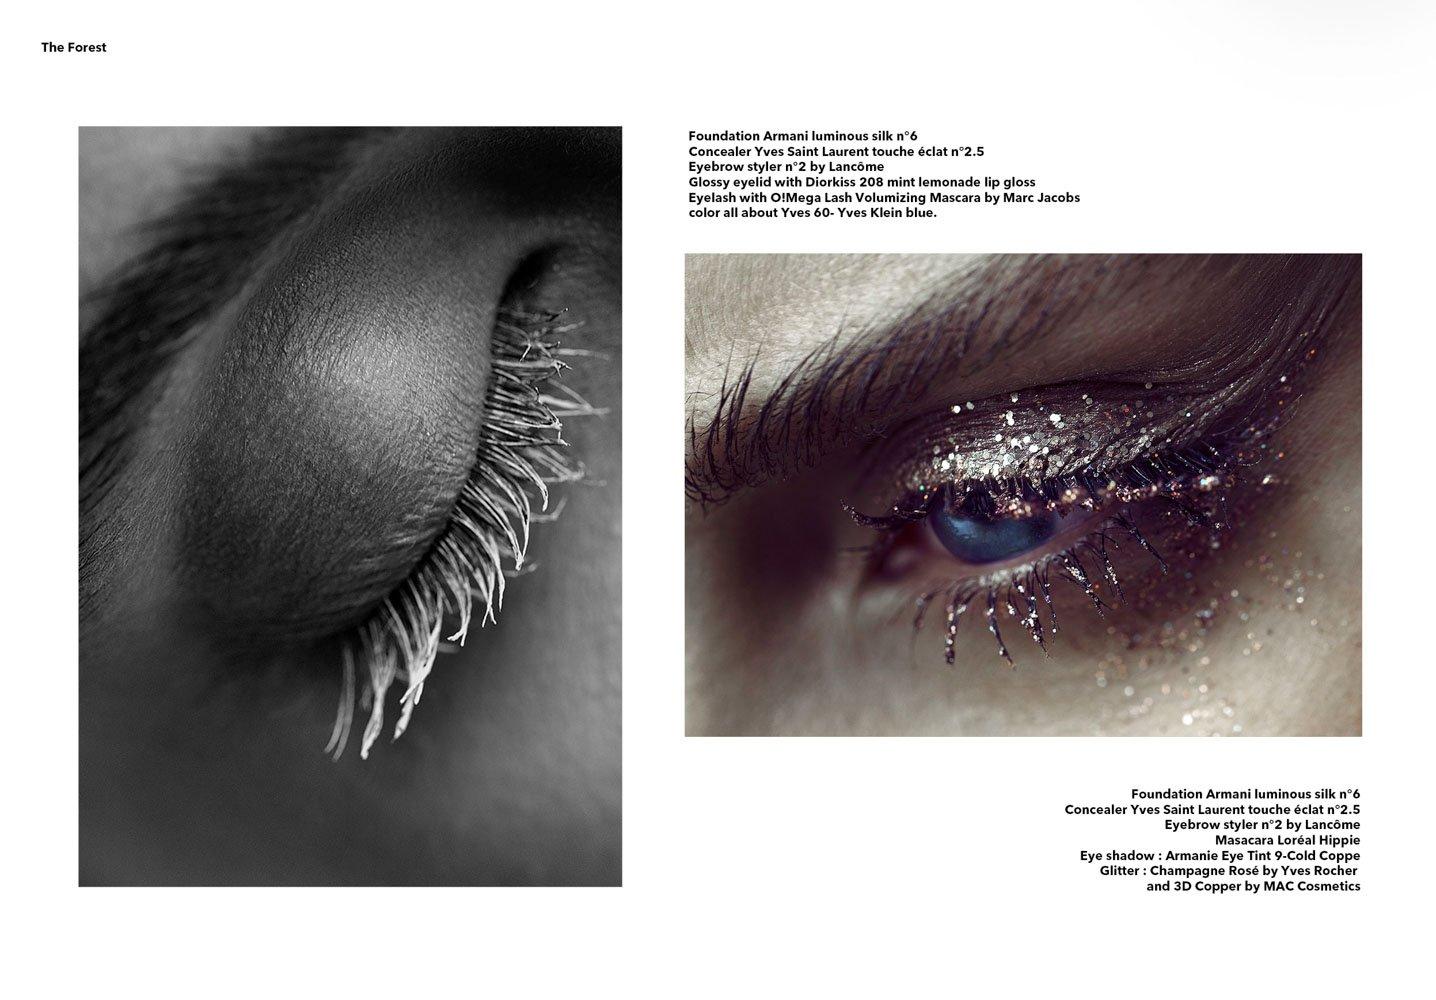 the_forest_magazine_ludovine-jamin_alexiane-guyon_0003